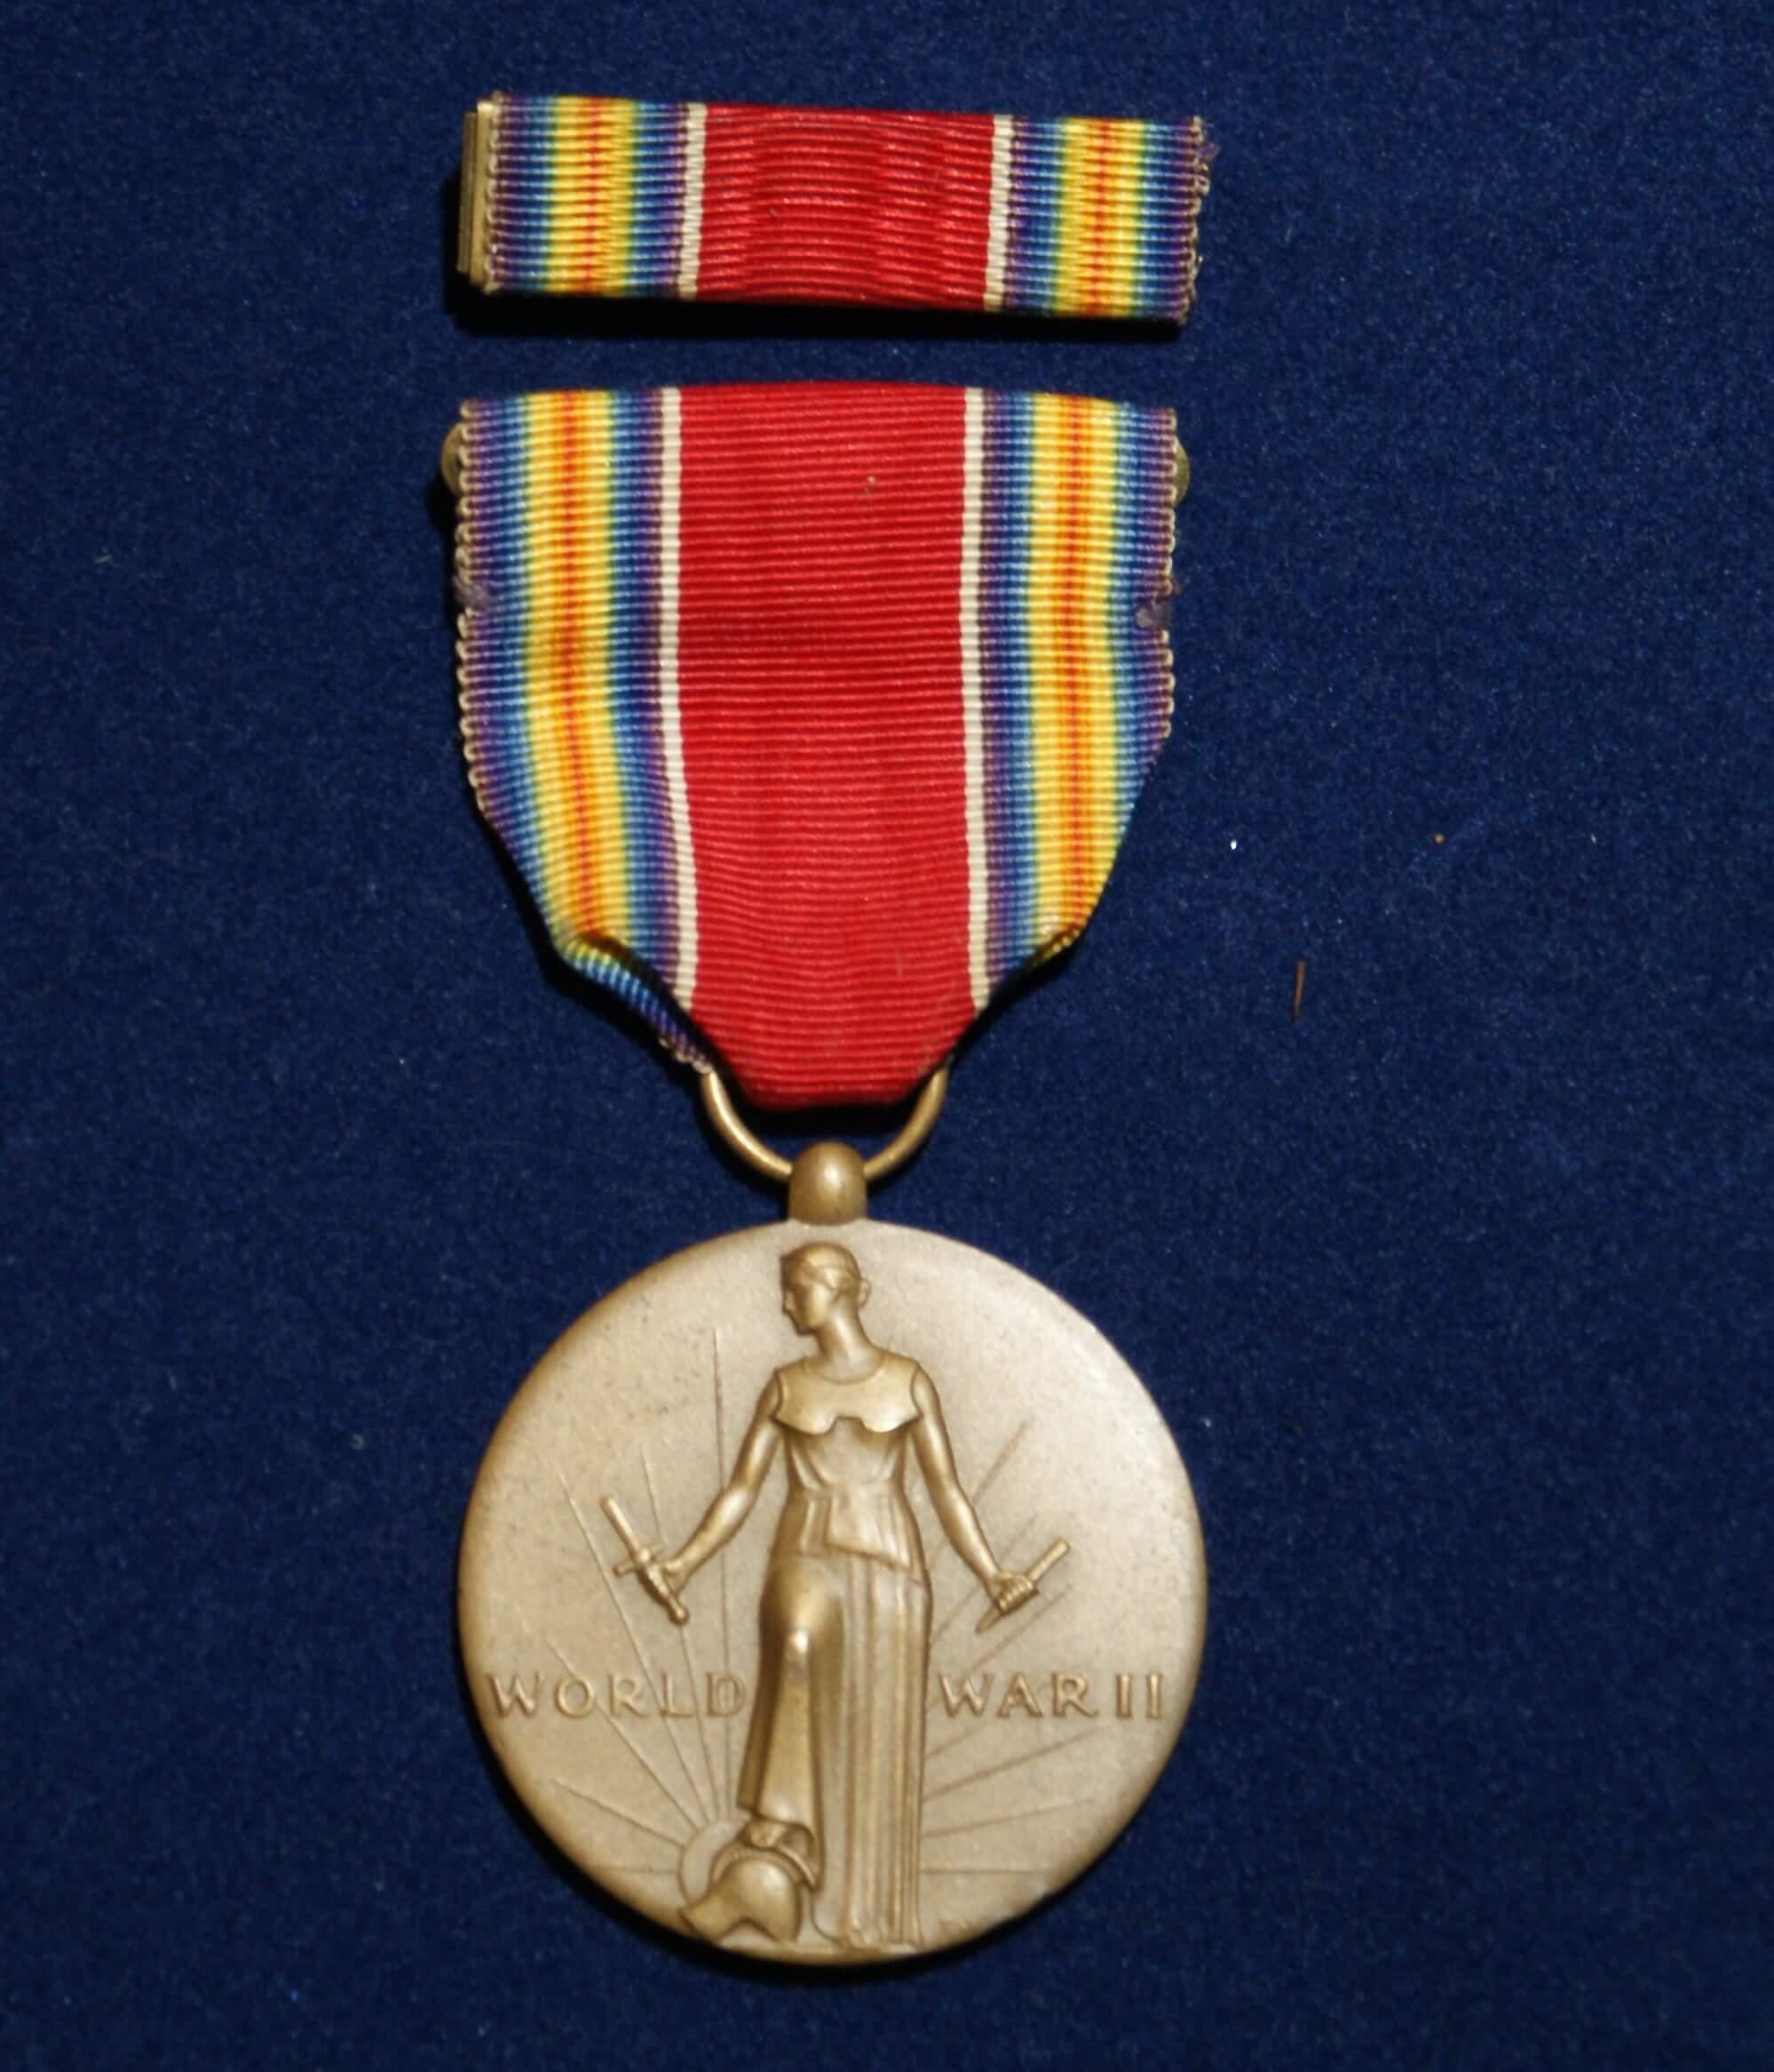 U.S.A. Victory medaille uit de tweede wereldoorlog wo2